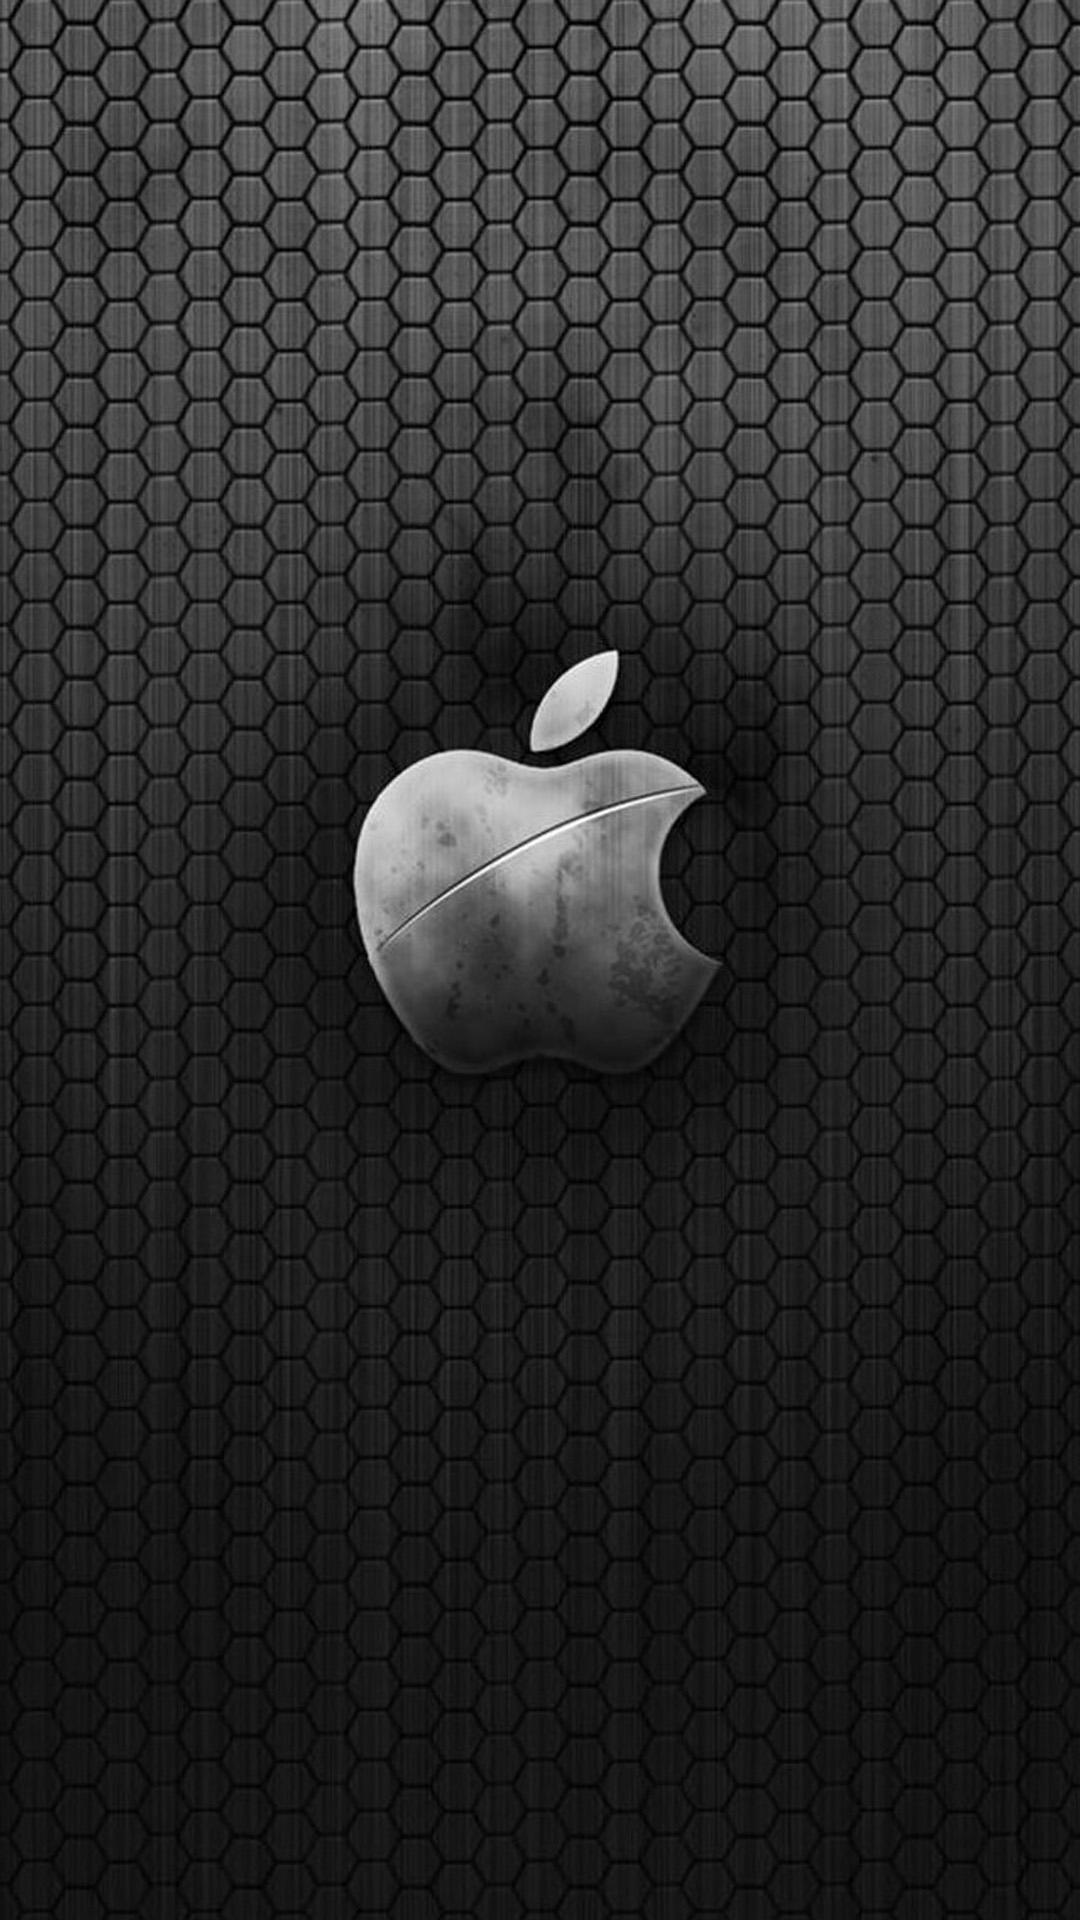 Metallic Apple Logo Wallpaper Iphone Wallpaper